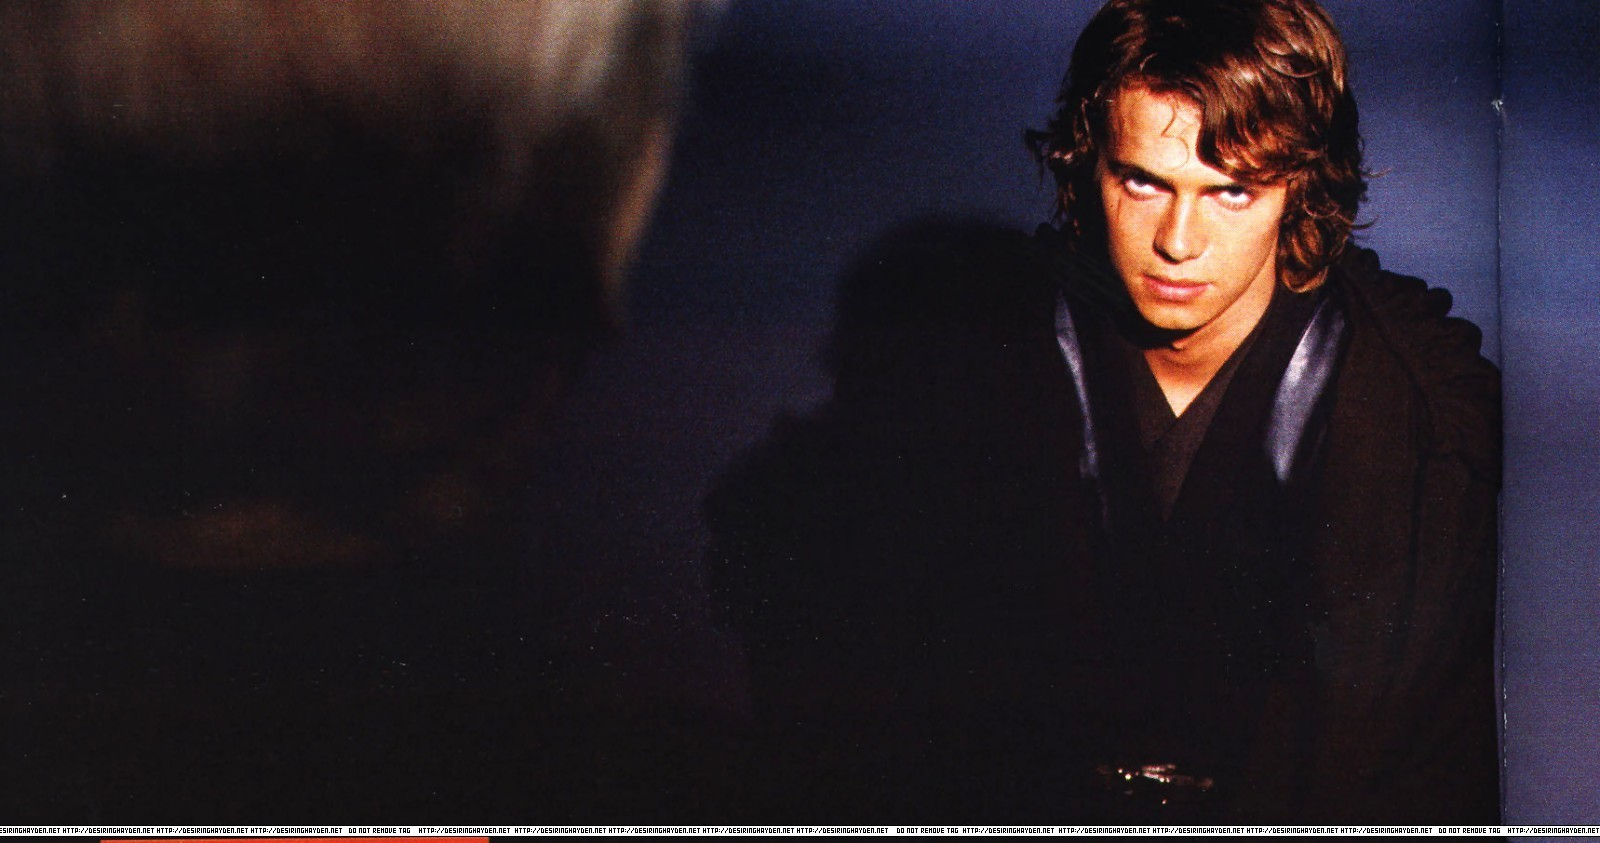 Star Wars: Revenge of the Sith images Anakin Skywalker HD wallpaper ...